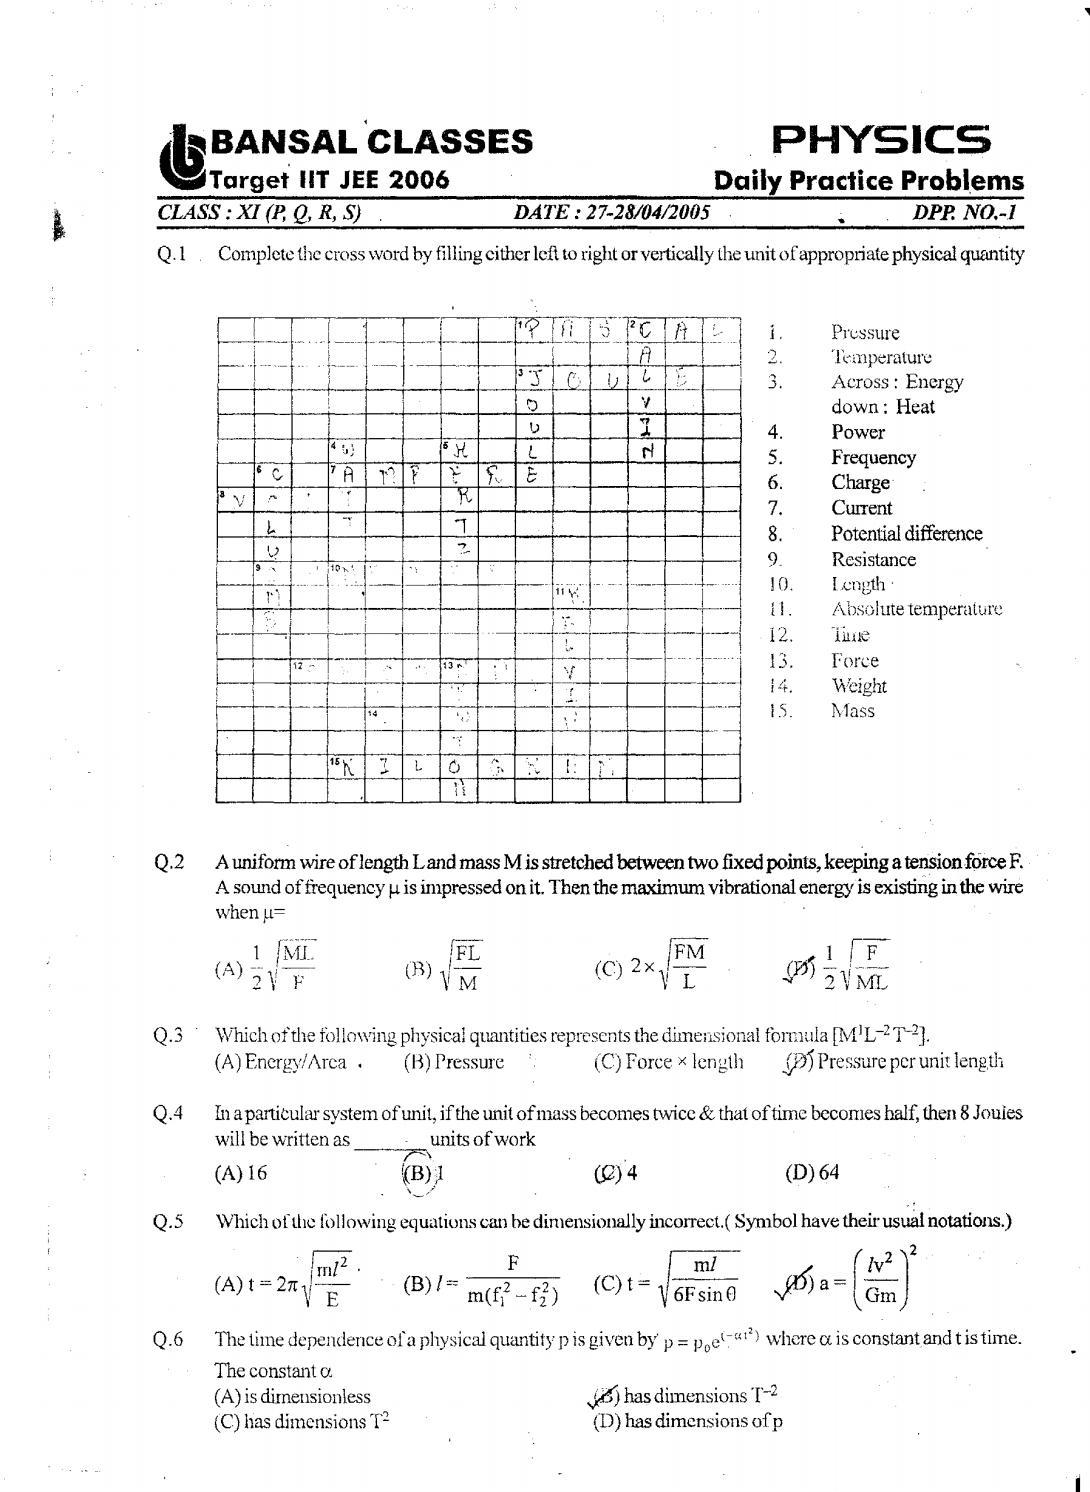 11th Standard Physics Dpps 55844dc959710 1 Pdf By S